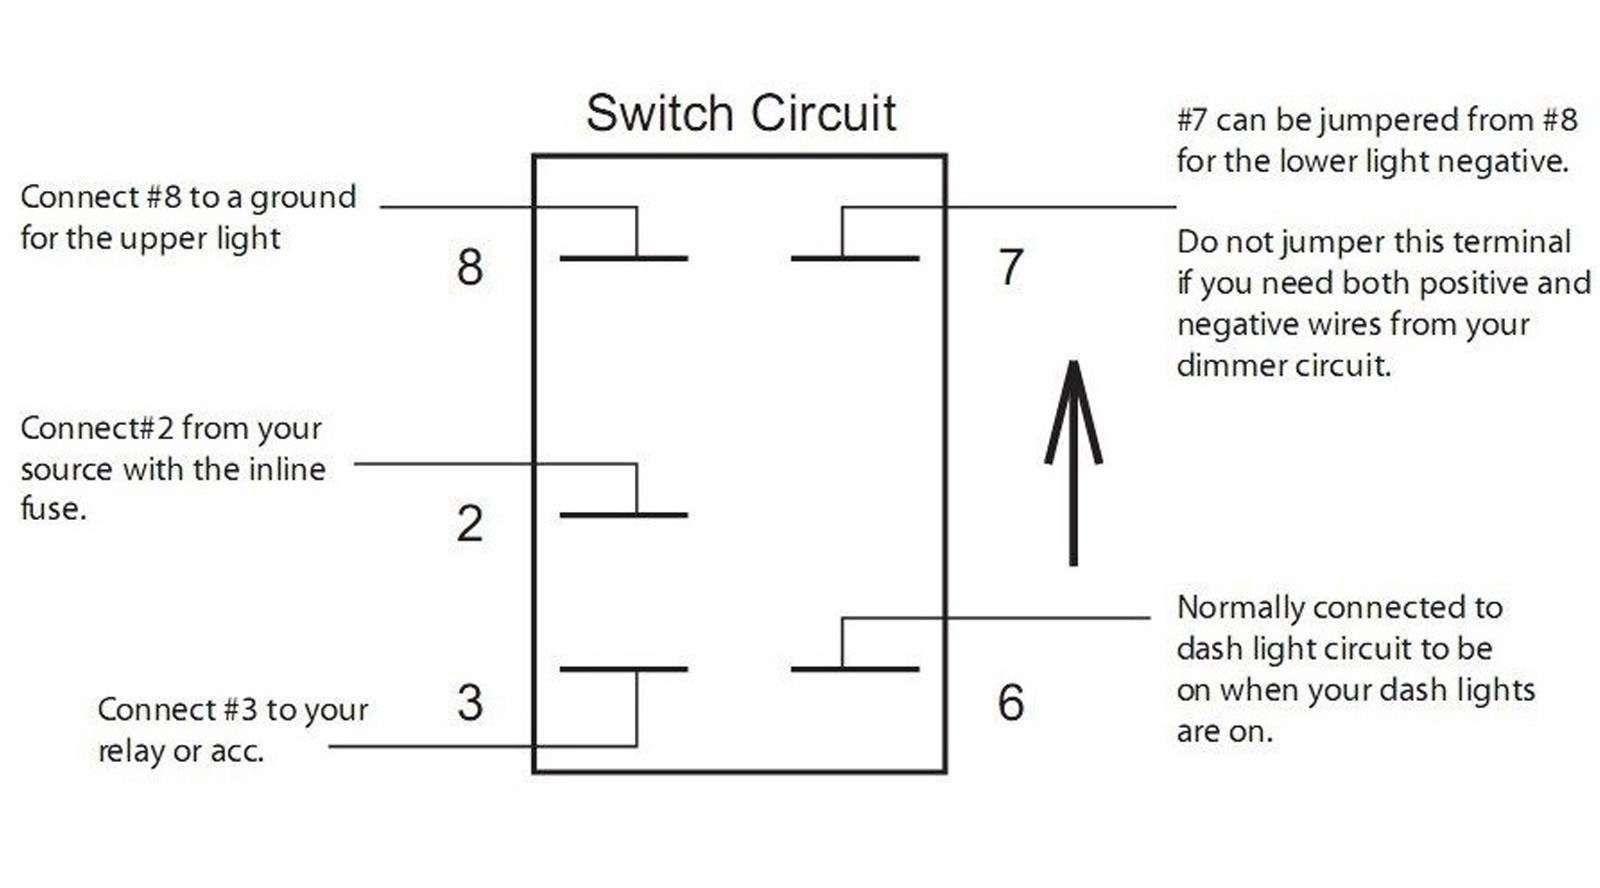 Wiring Diagram Electrical Wiring Diagram Electrical In 2020 Electrical Wiring Diagram Trailer Wiring Diagram Electrical Diagram